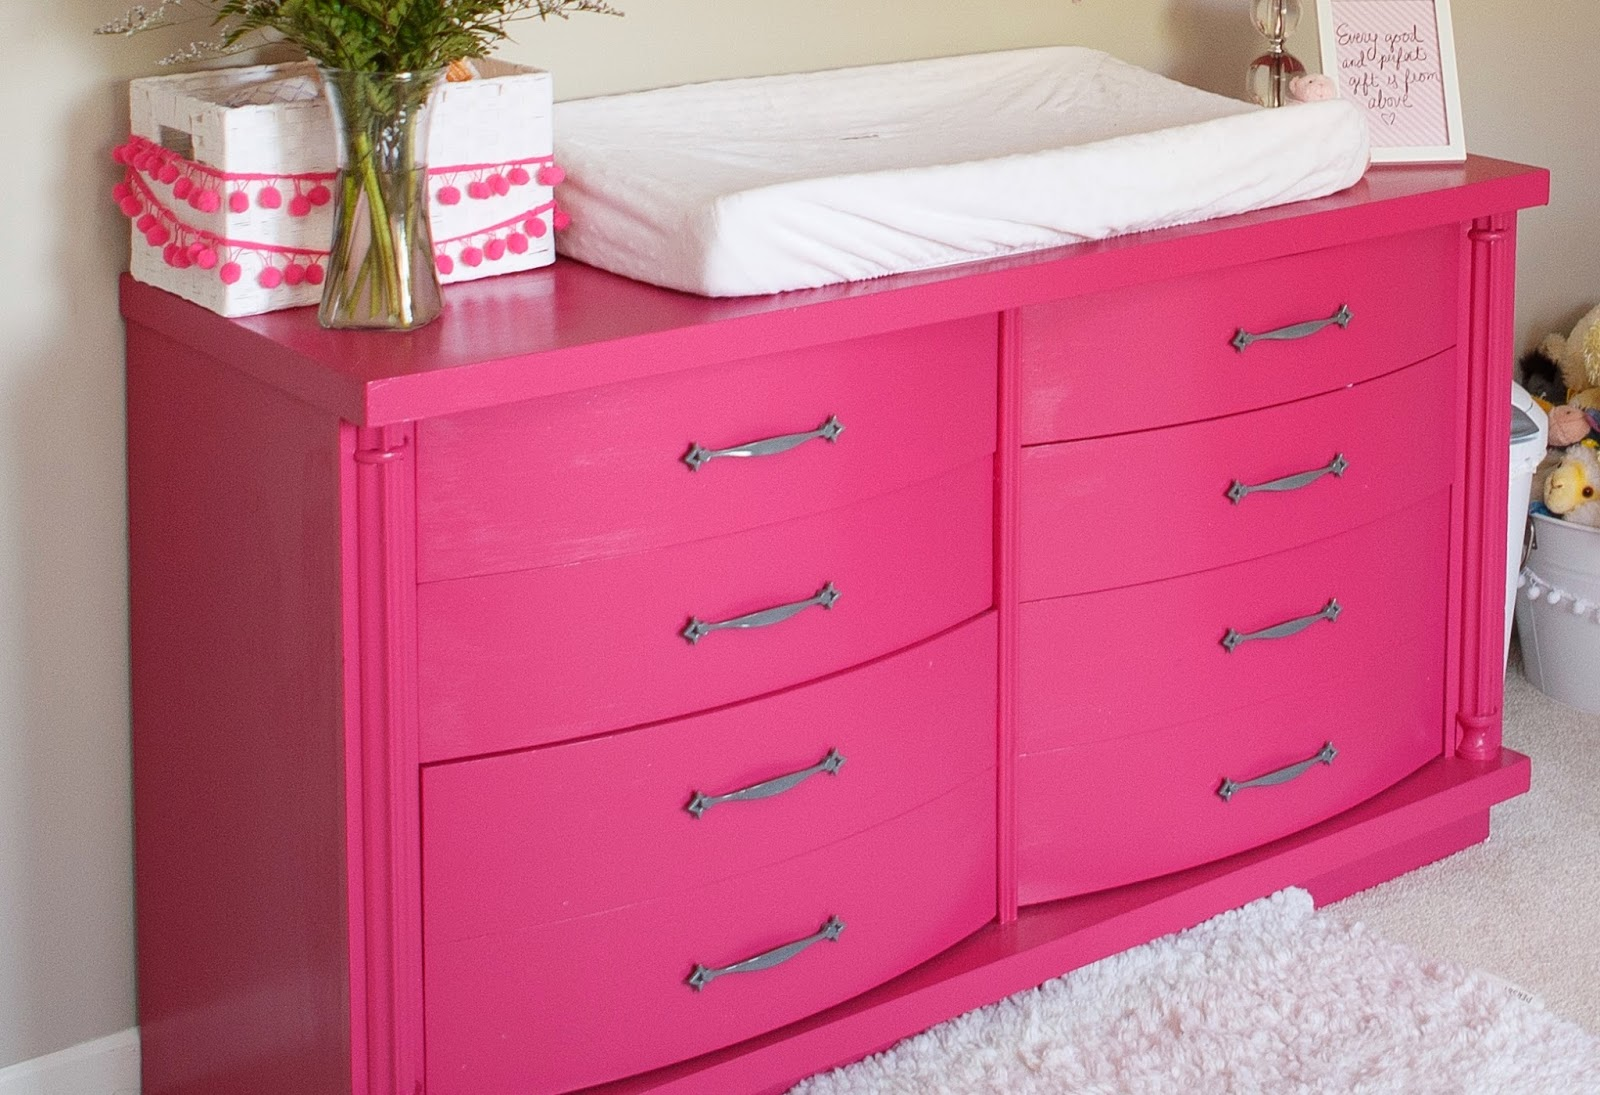 pink dressers  bestdressers  - card k penz   o jpg